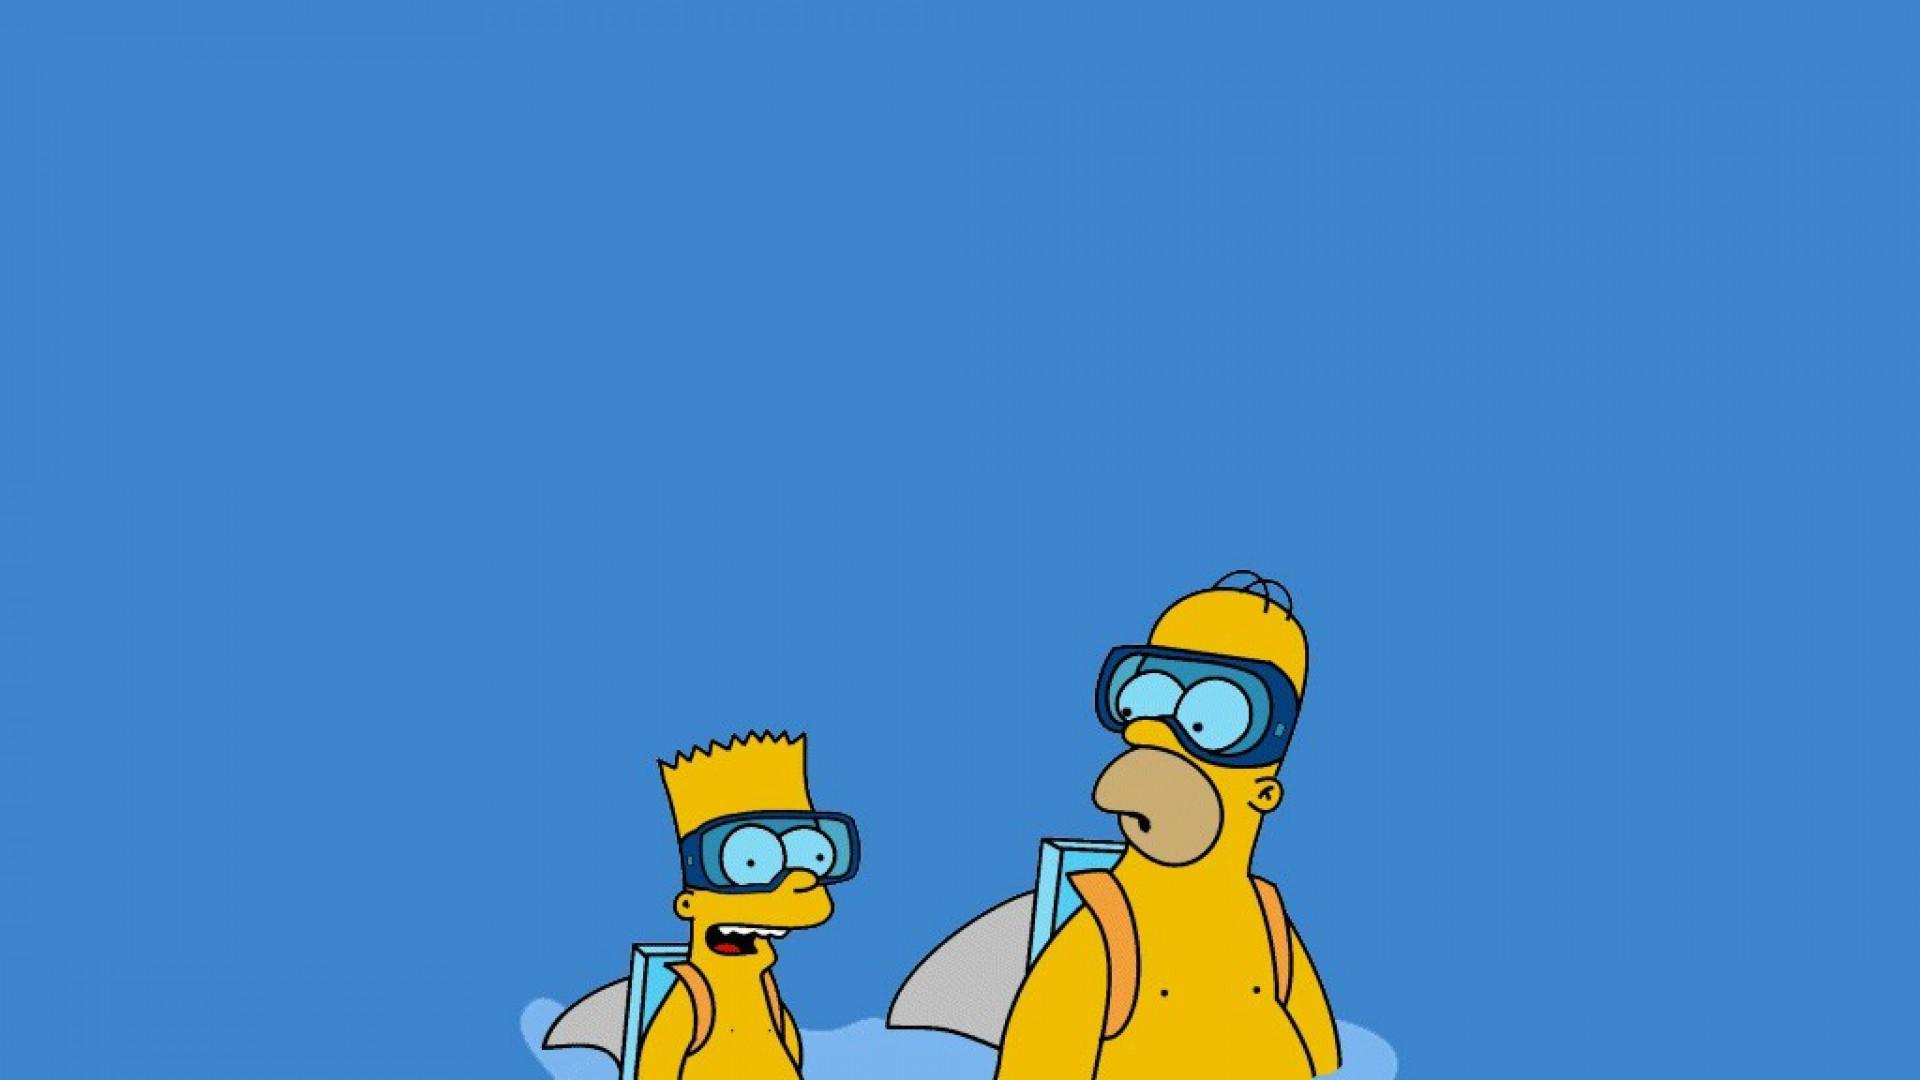 49 Bart Simpson Hd Wallpaper On Wallpapersafari